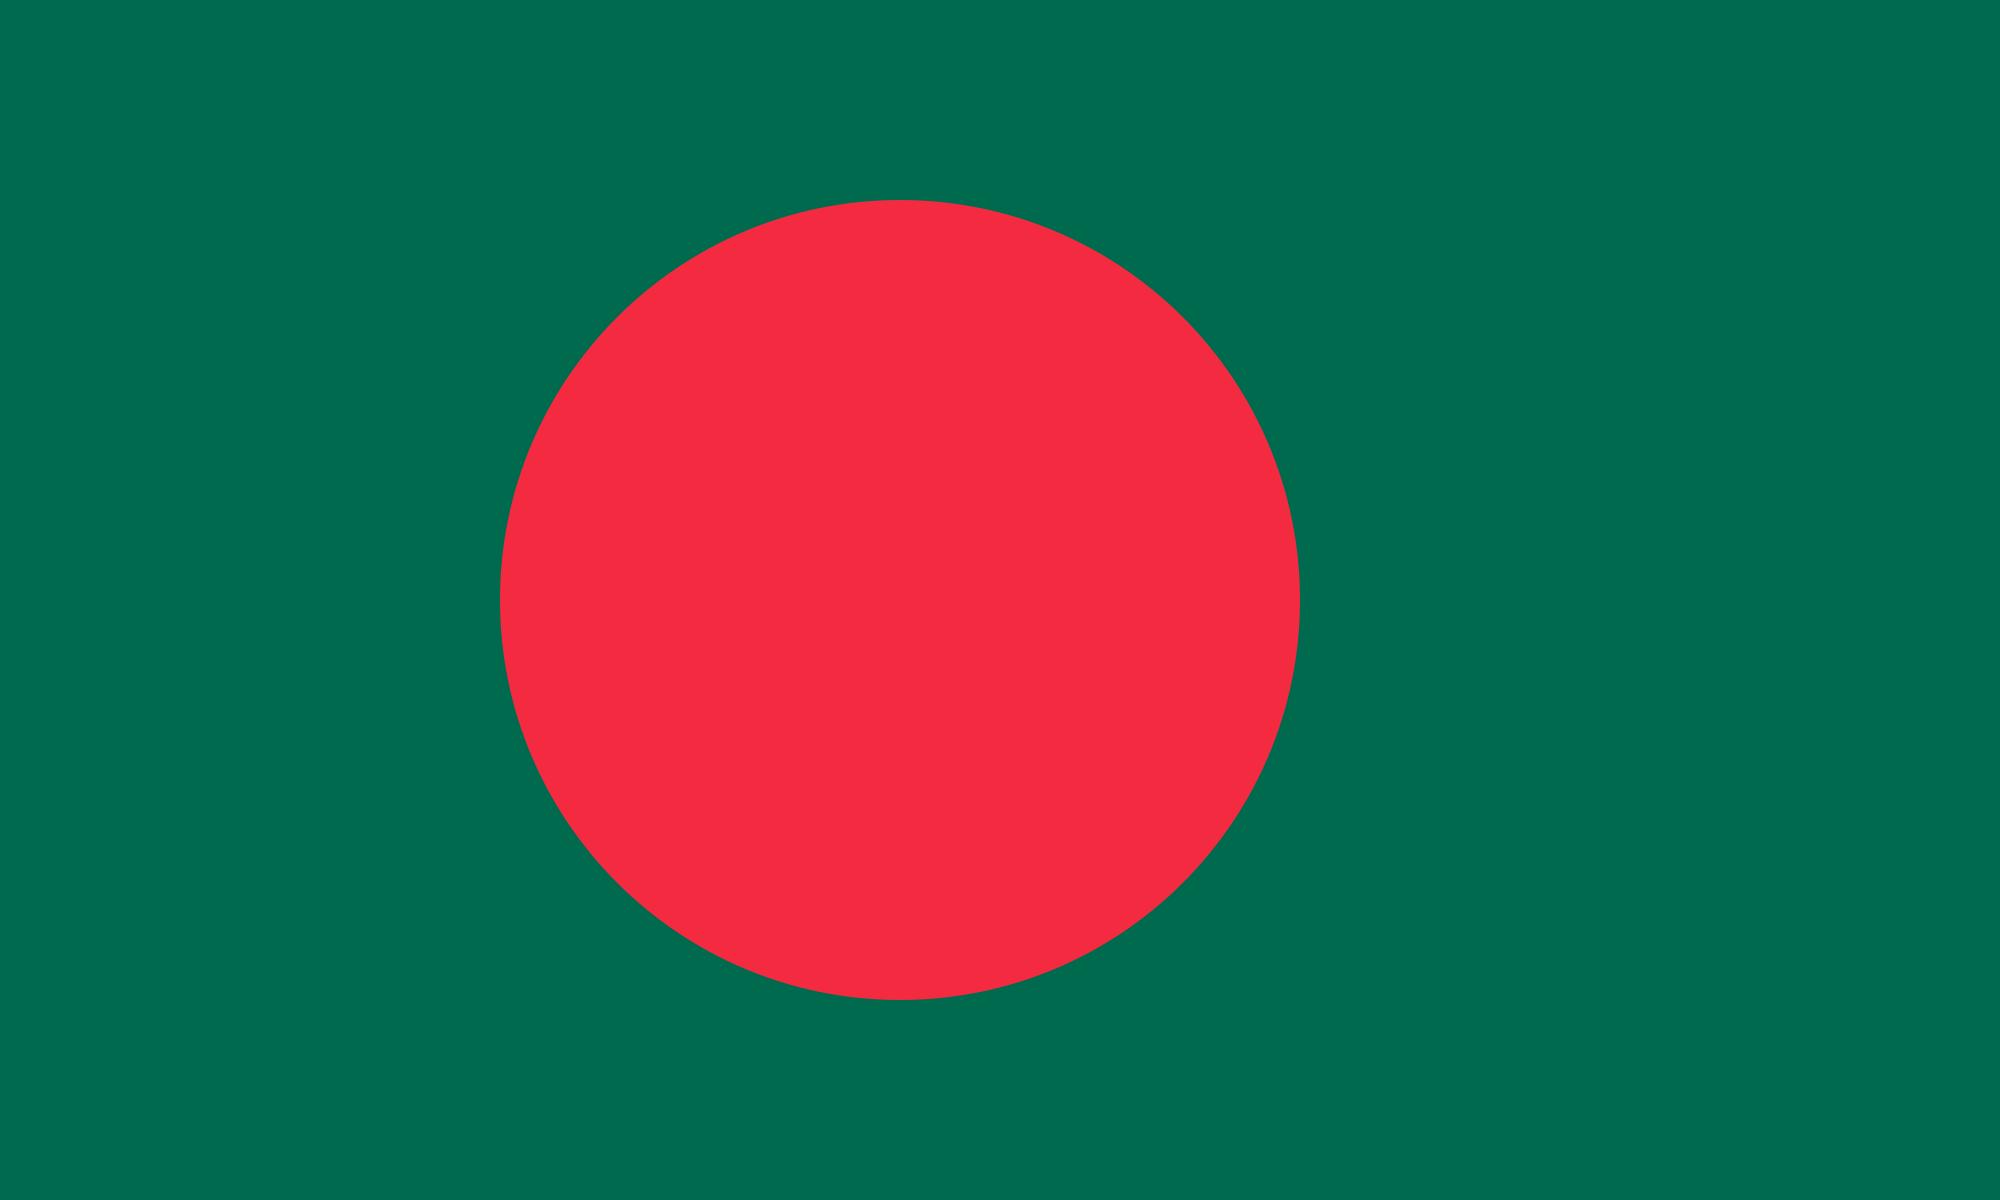 covid19deathtollcrosses2000inbangladesh